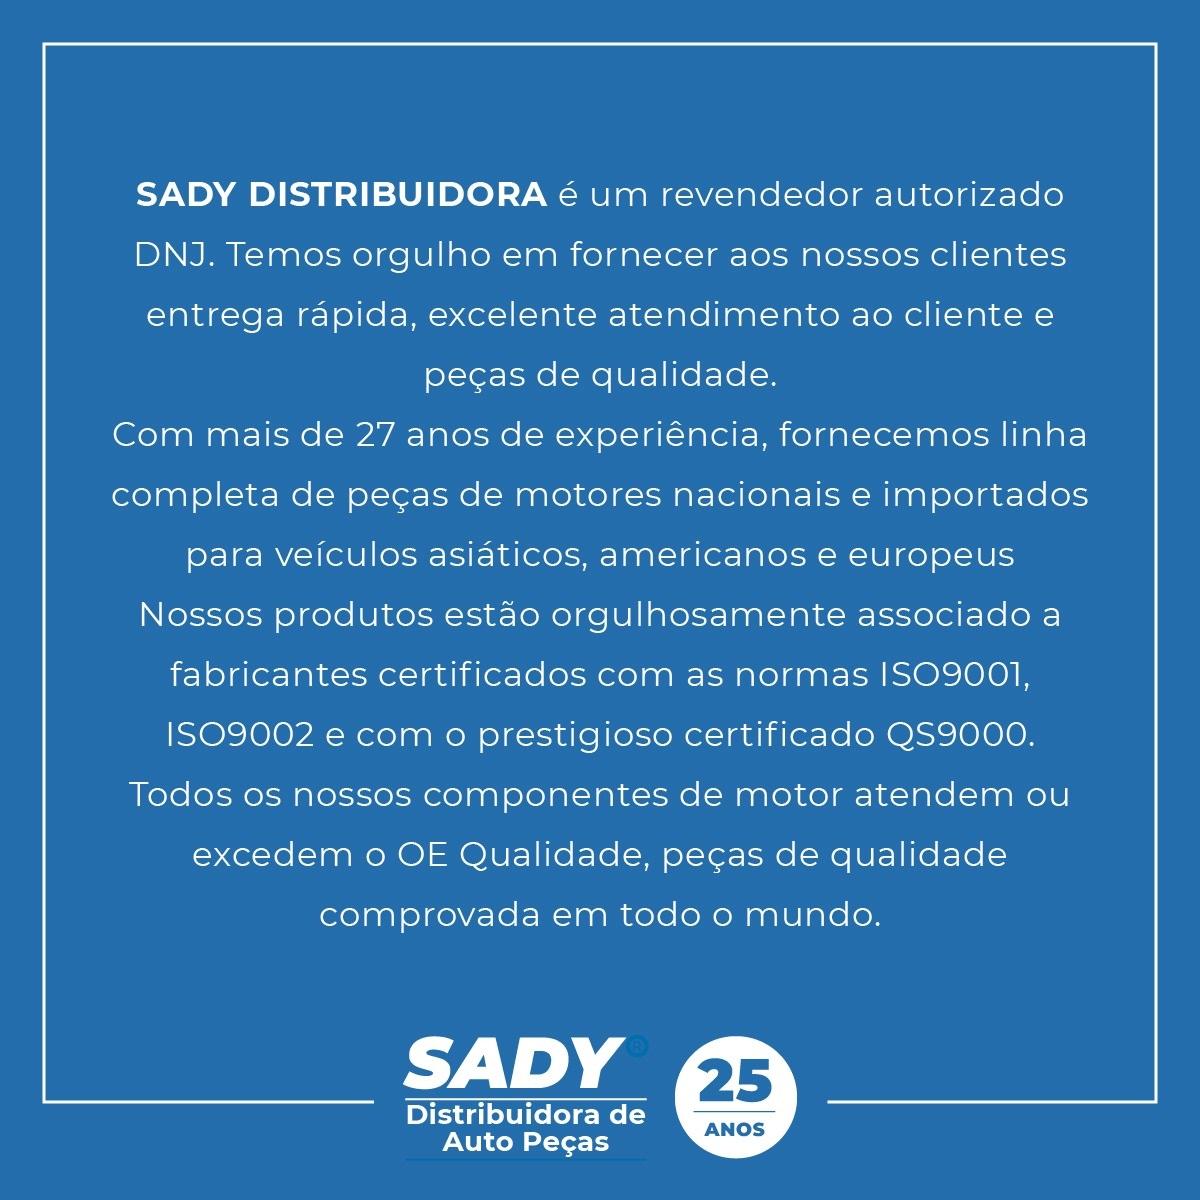 BOMBA DE OLEO DO MOTOR ISUZU 2.4D C240 EMPILHADEIRA